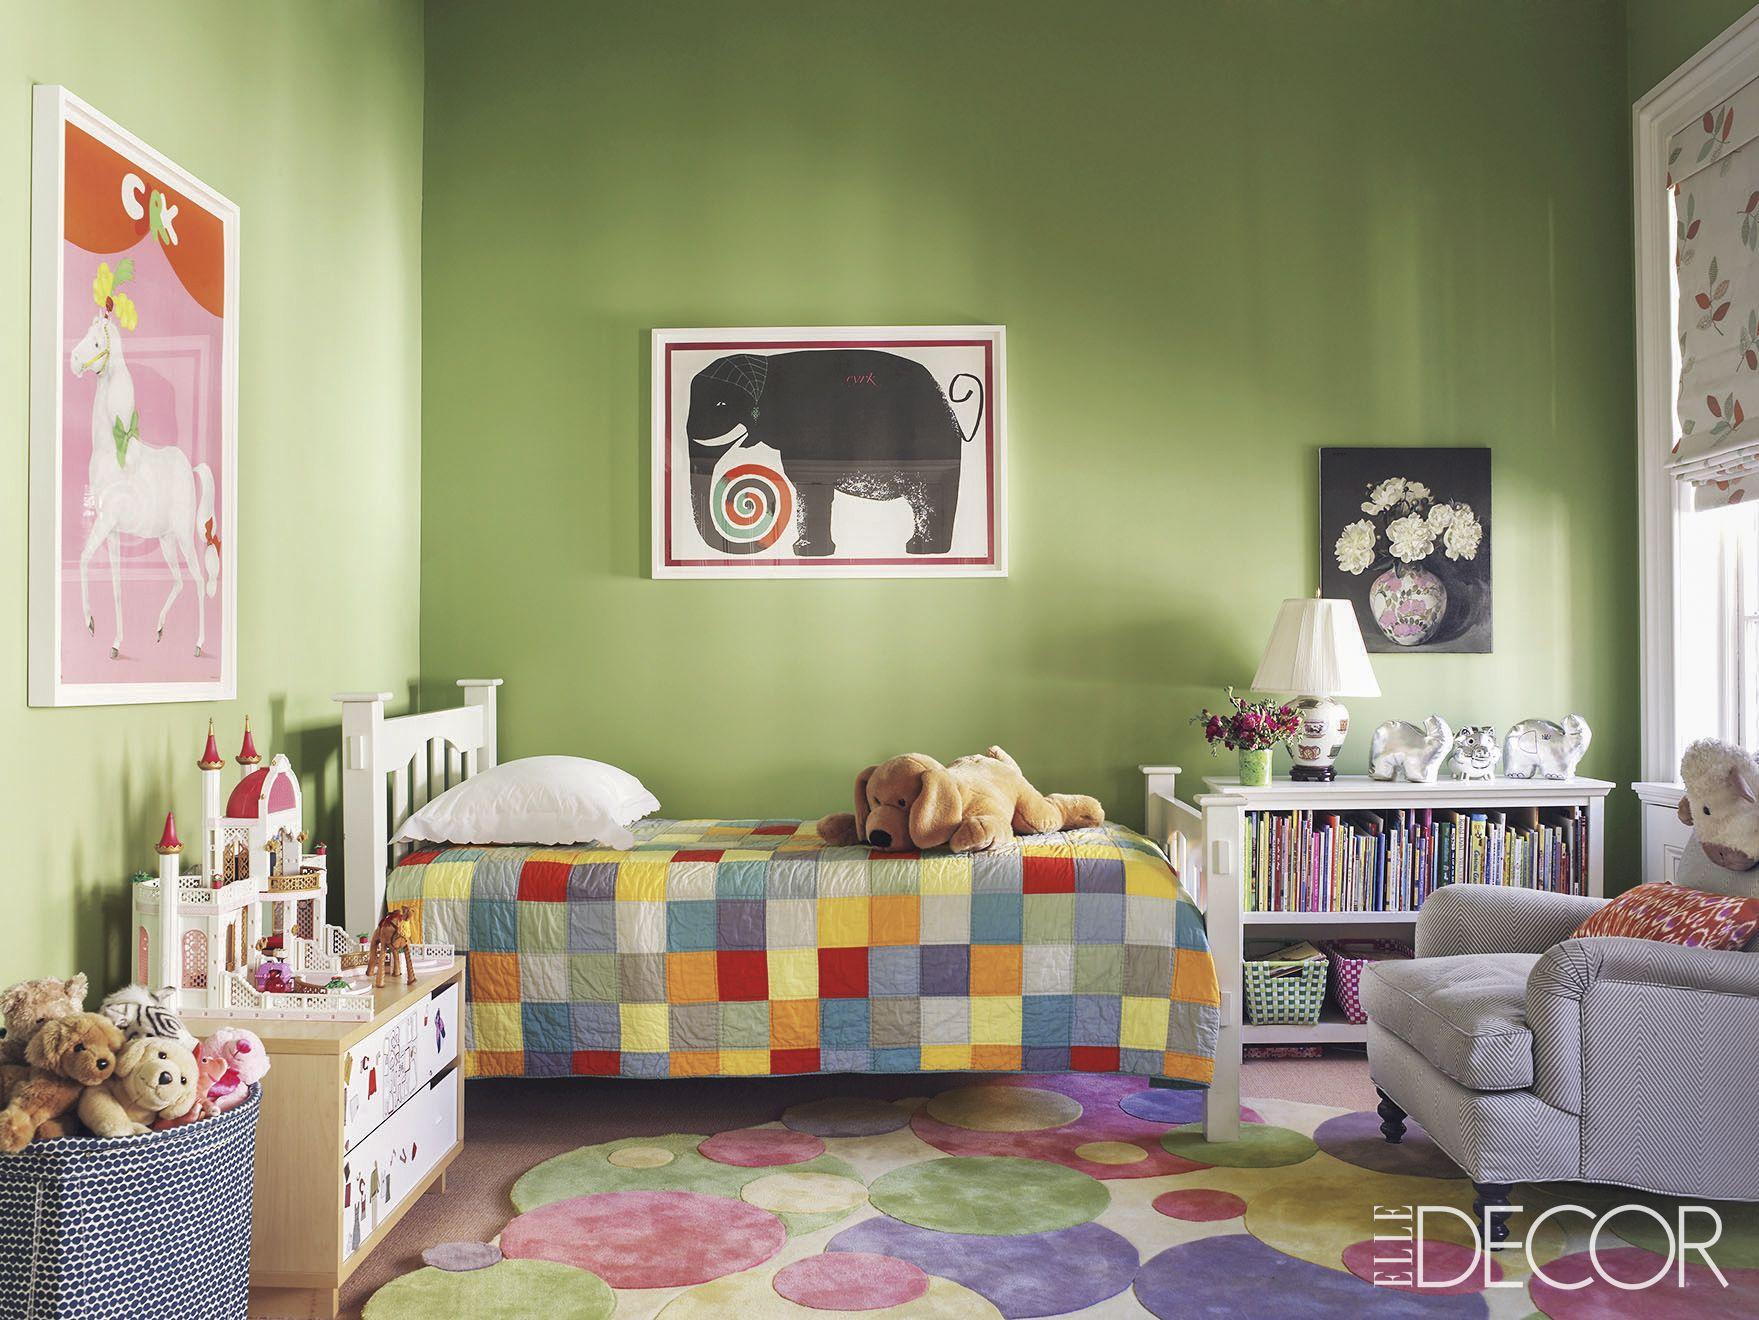 43 small bedroom design ideas decorating tips for small bedrooms rh elledecor com Kitchen Decorating Ideas Teenage Room Decorating Ideas for Girls